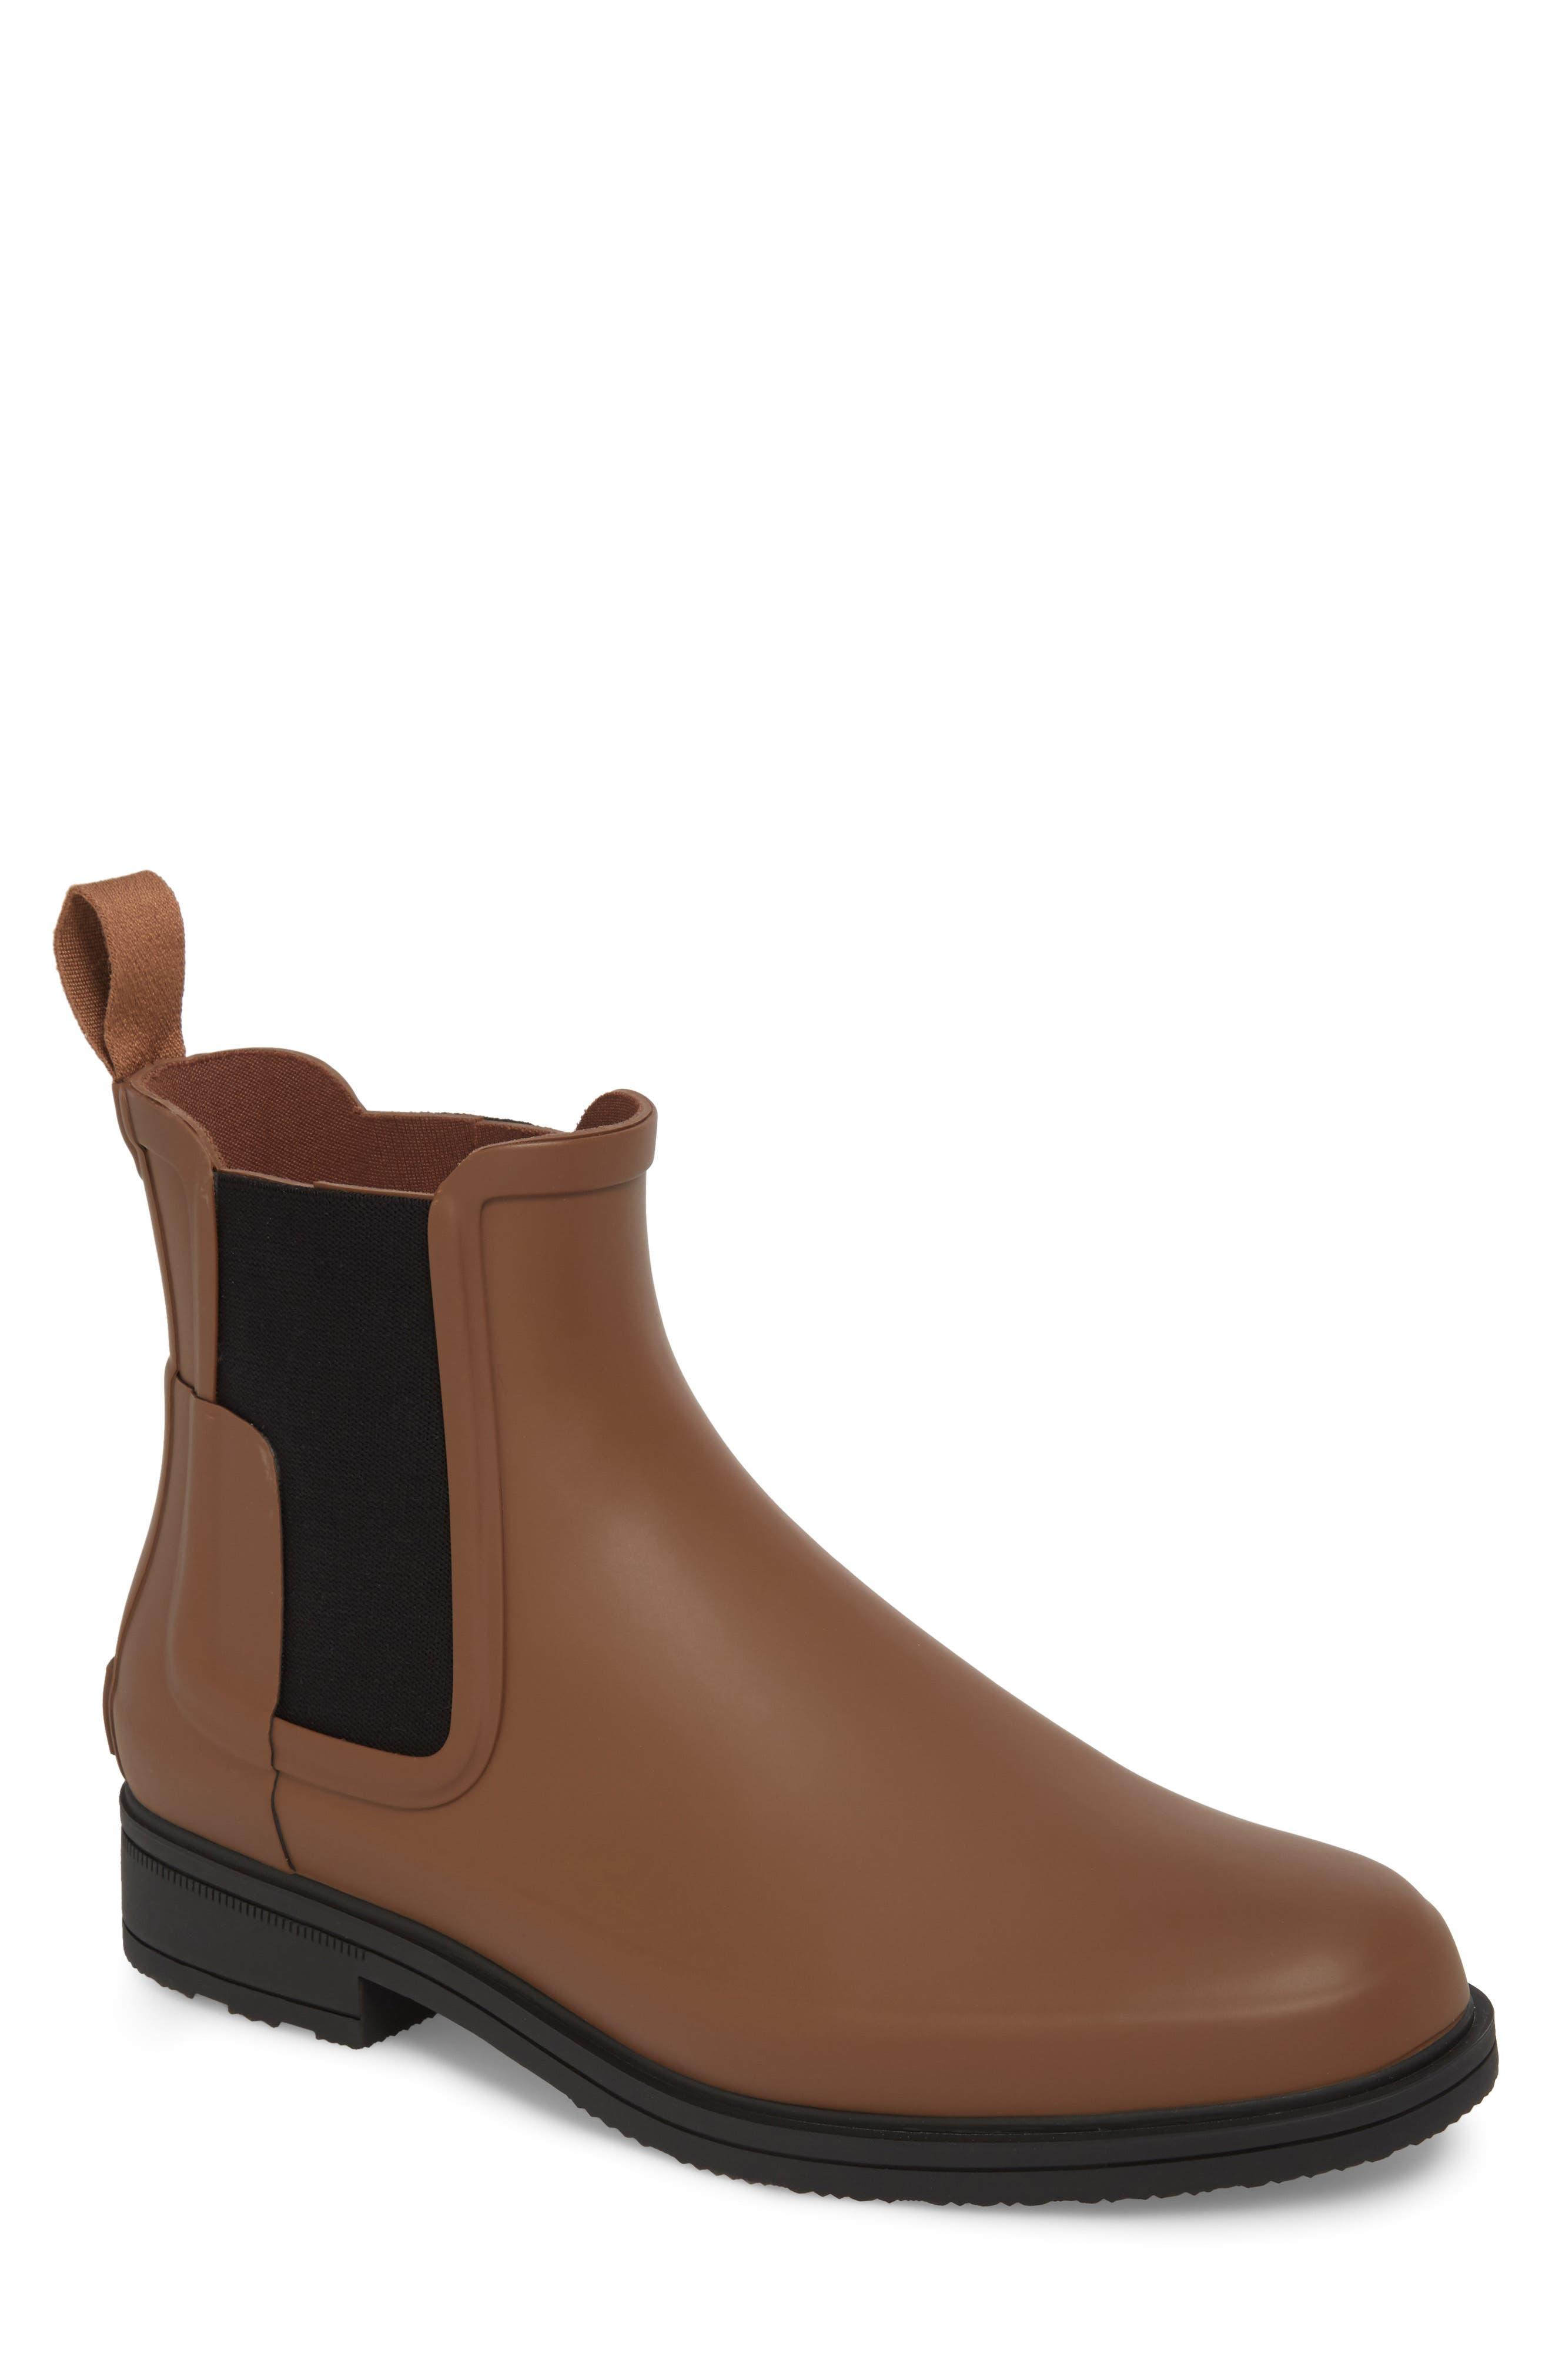 Main Image - Hunter Original Refined Waterproof Chelsea Boot (Men)